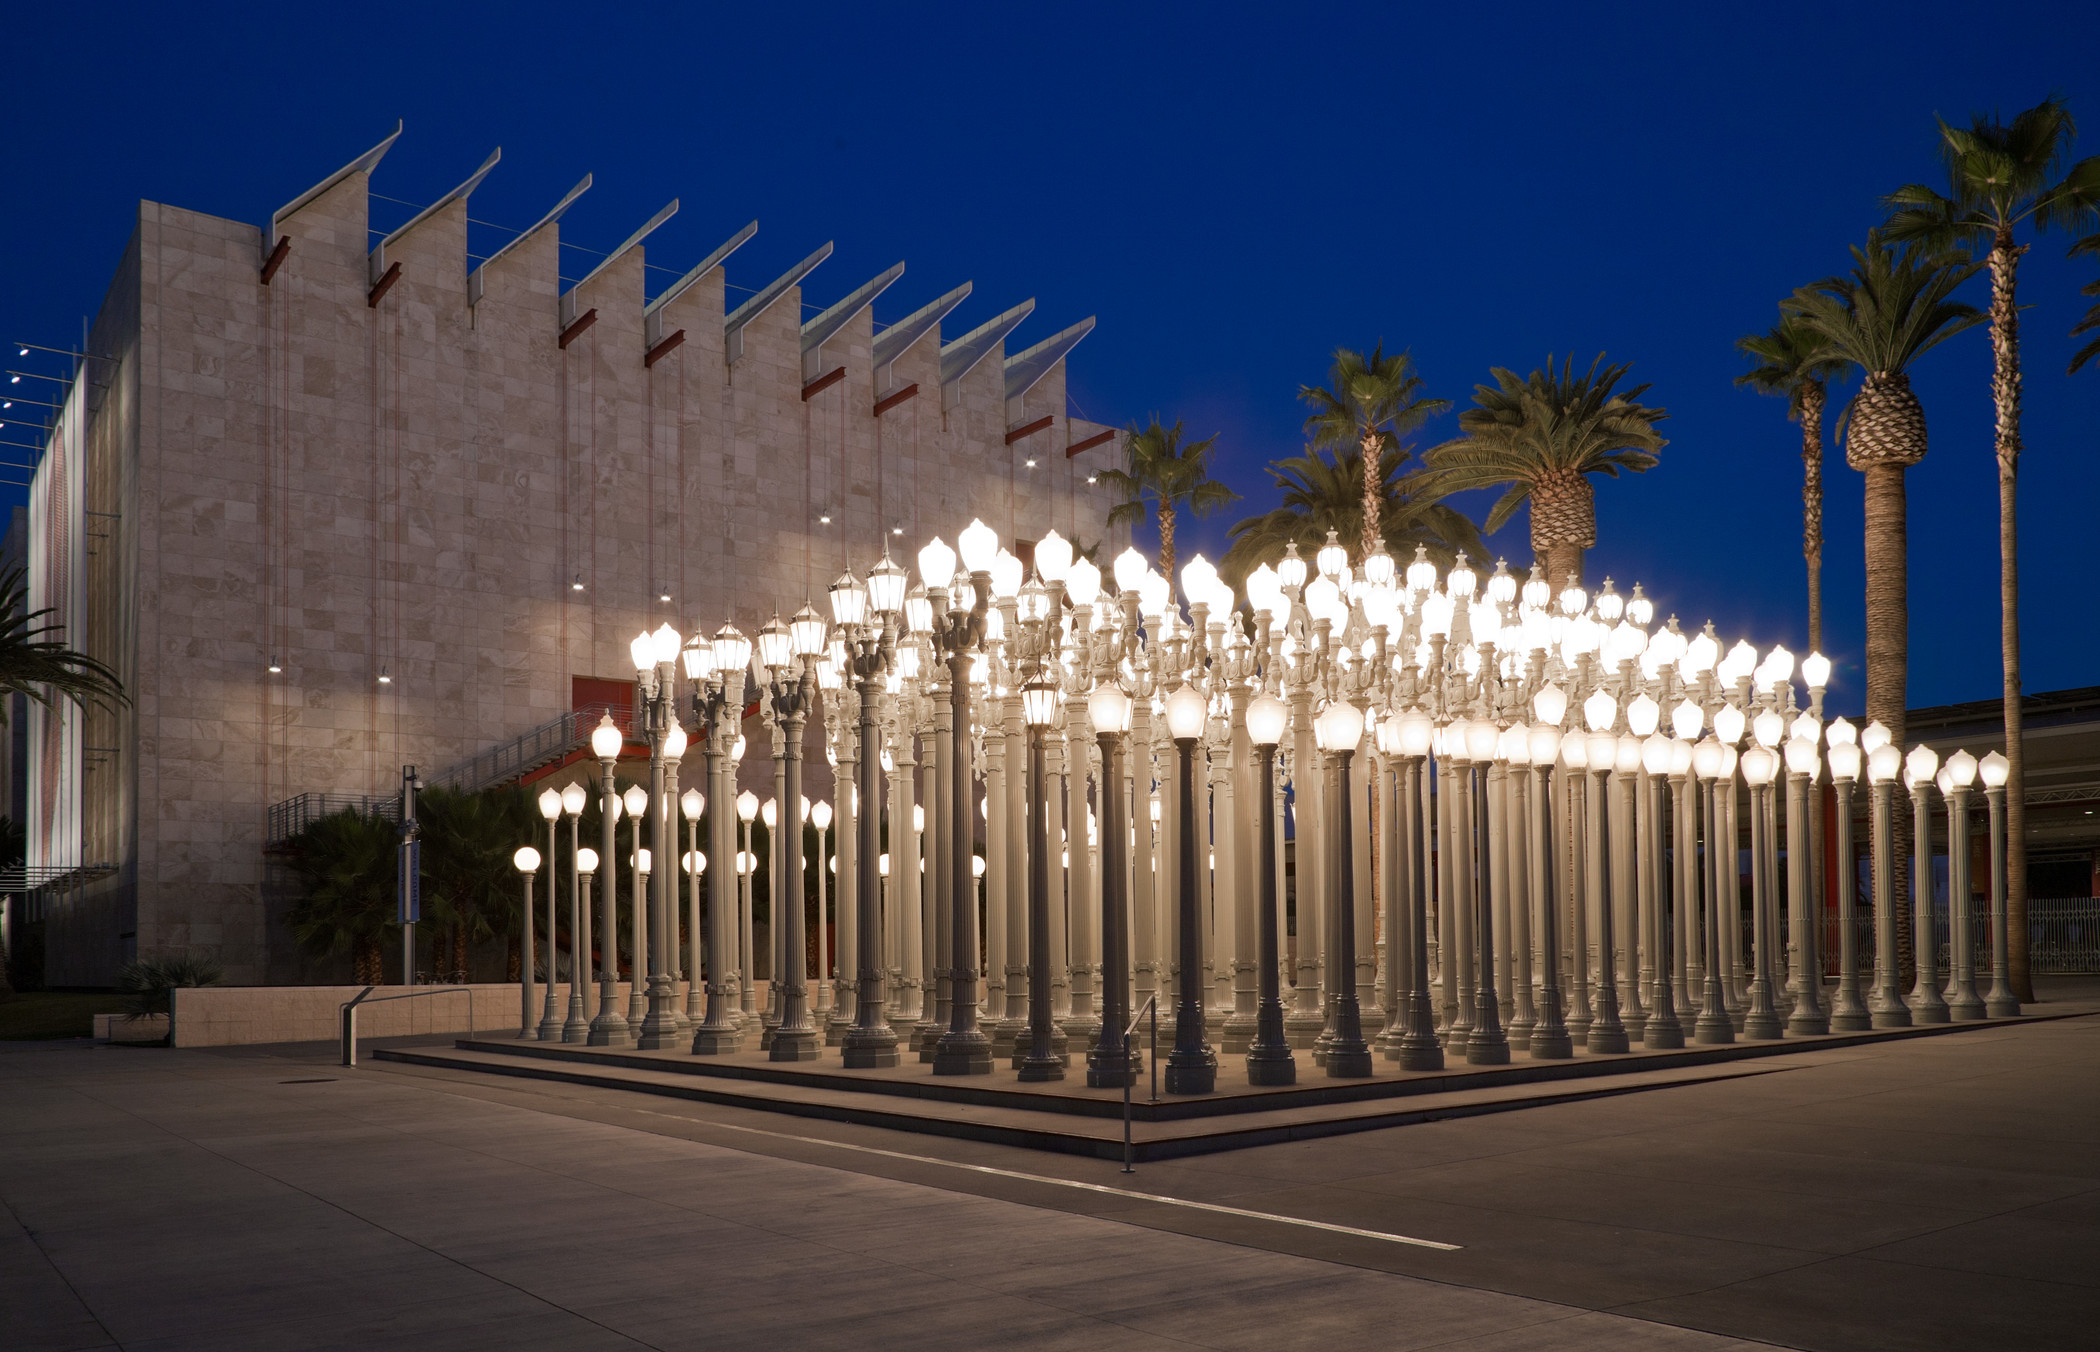 Chris Burden's Urban Light